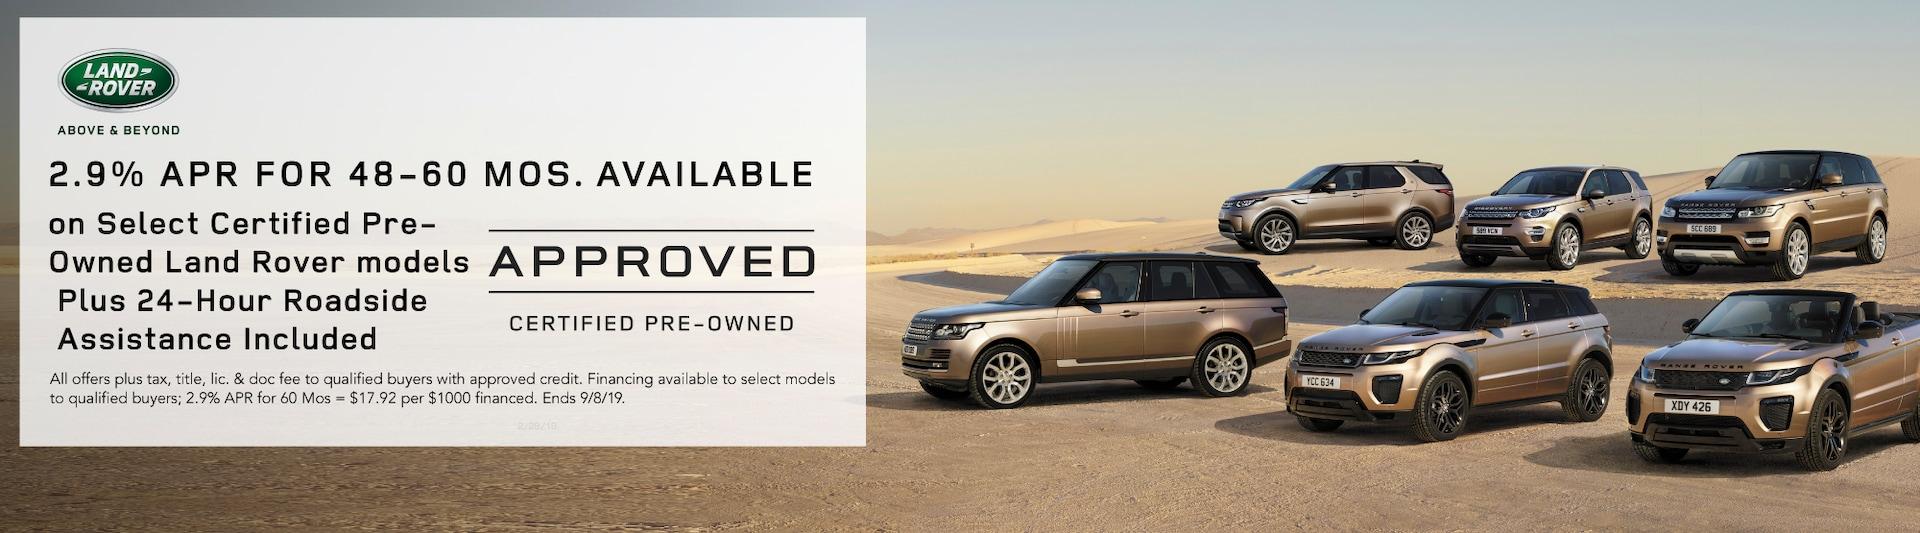 Land Rover Chicago >> Land Rover Of Orland Park Chicago Land Rover Dealer Serving